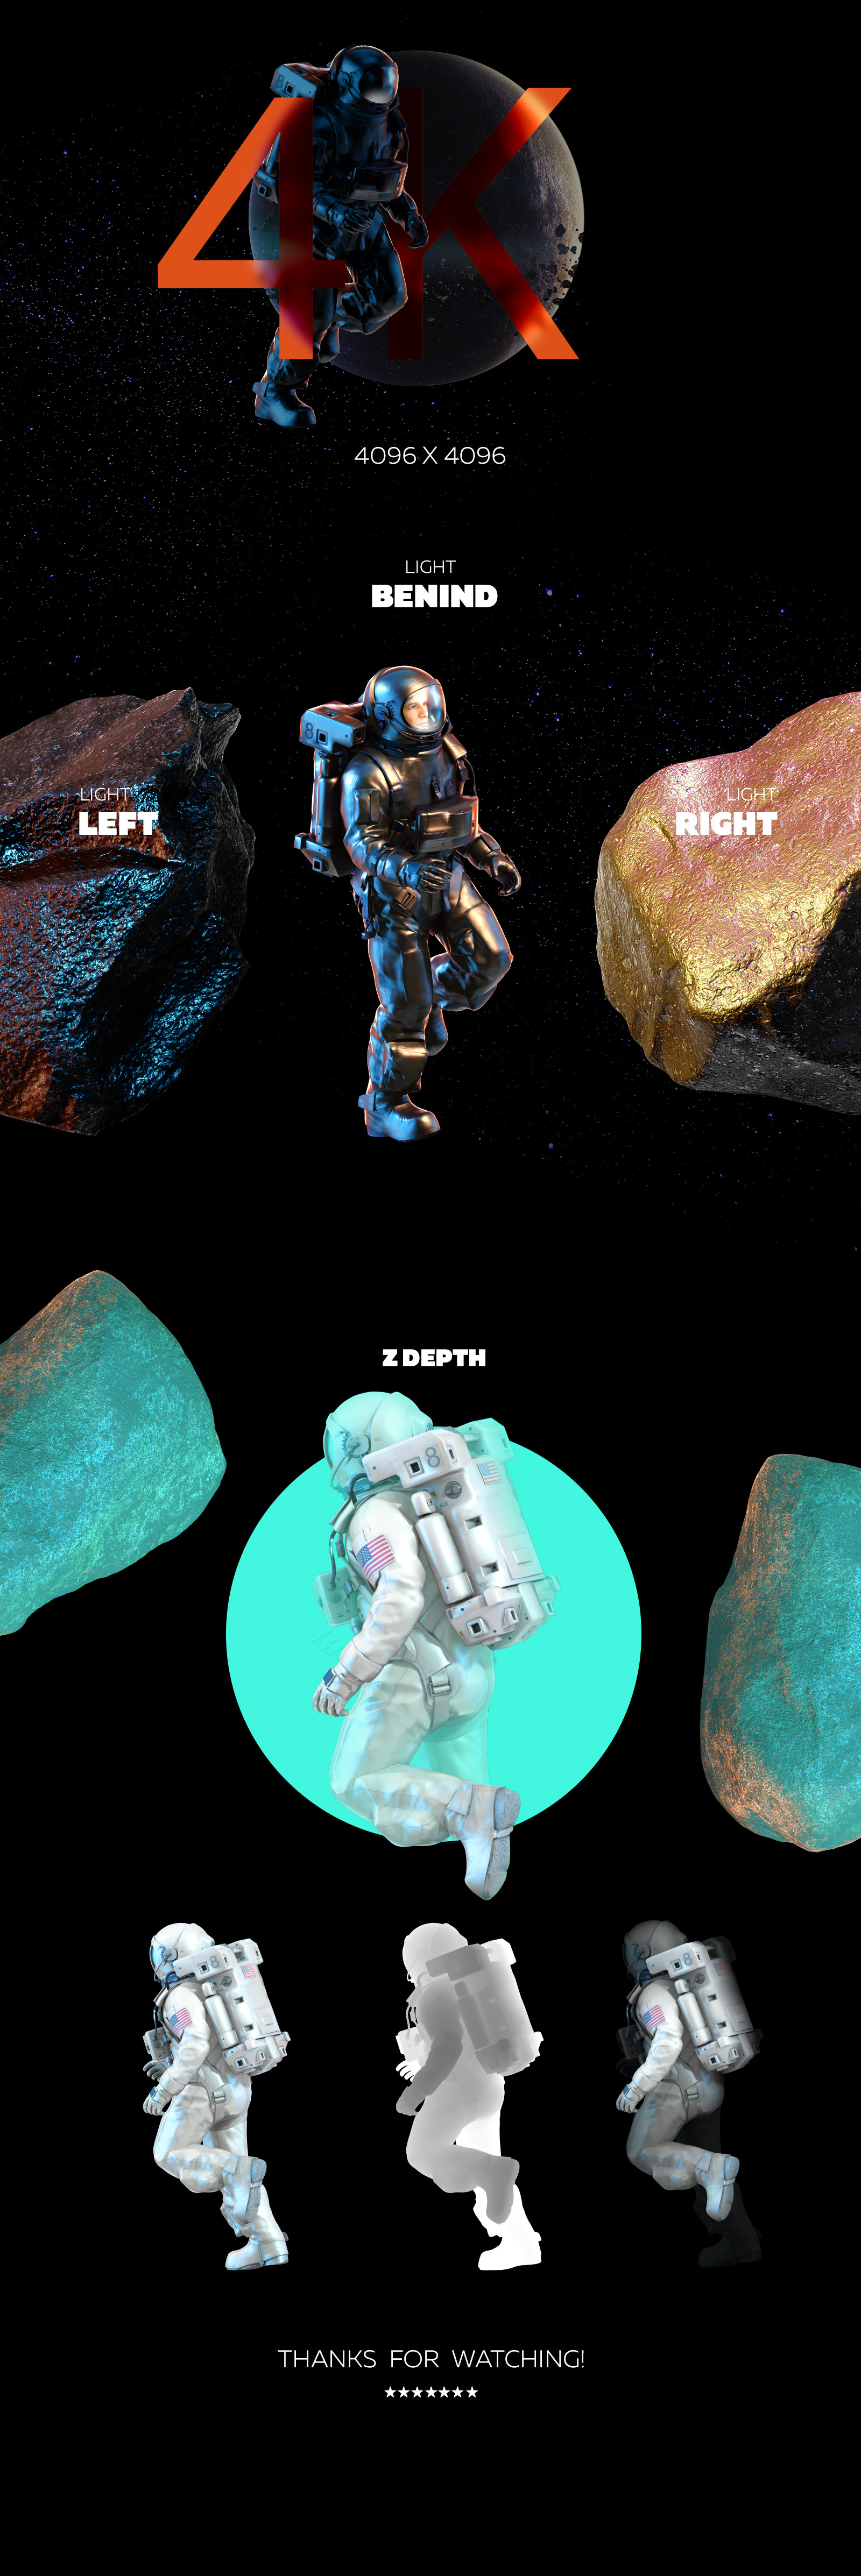 3D Mockup Space Astronaut #07